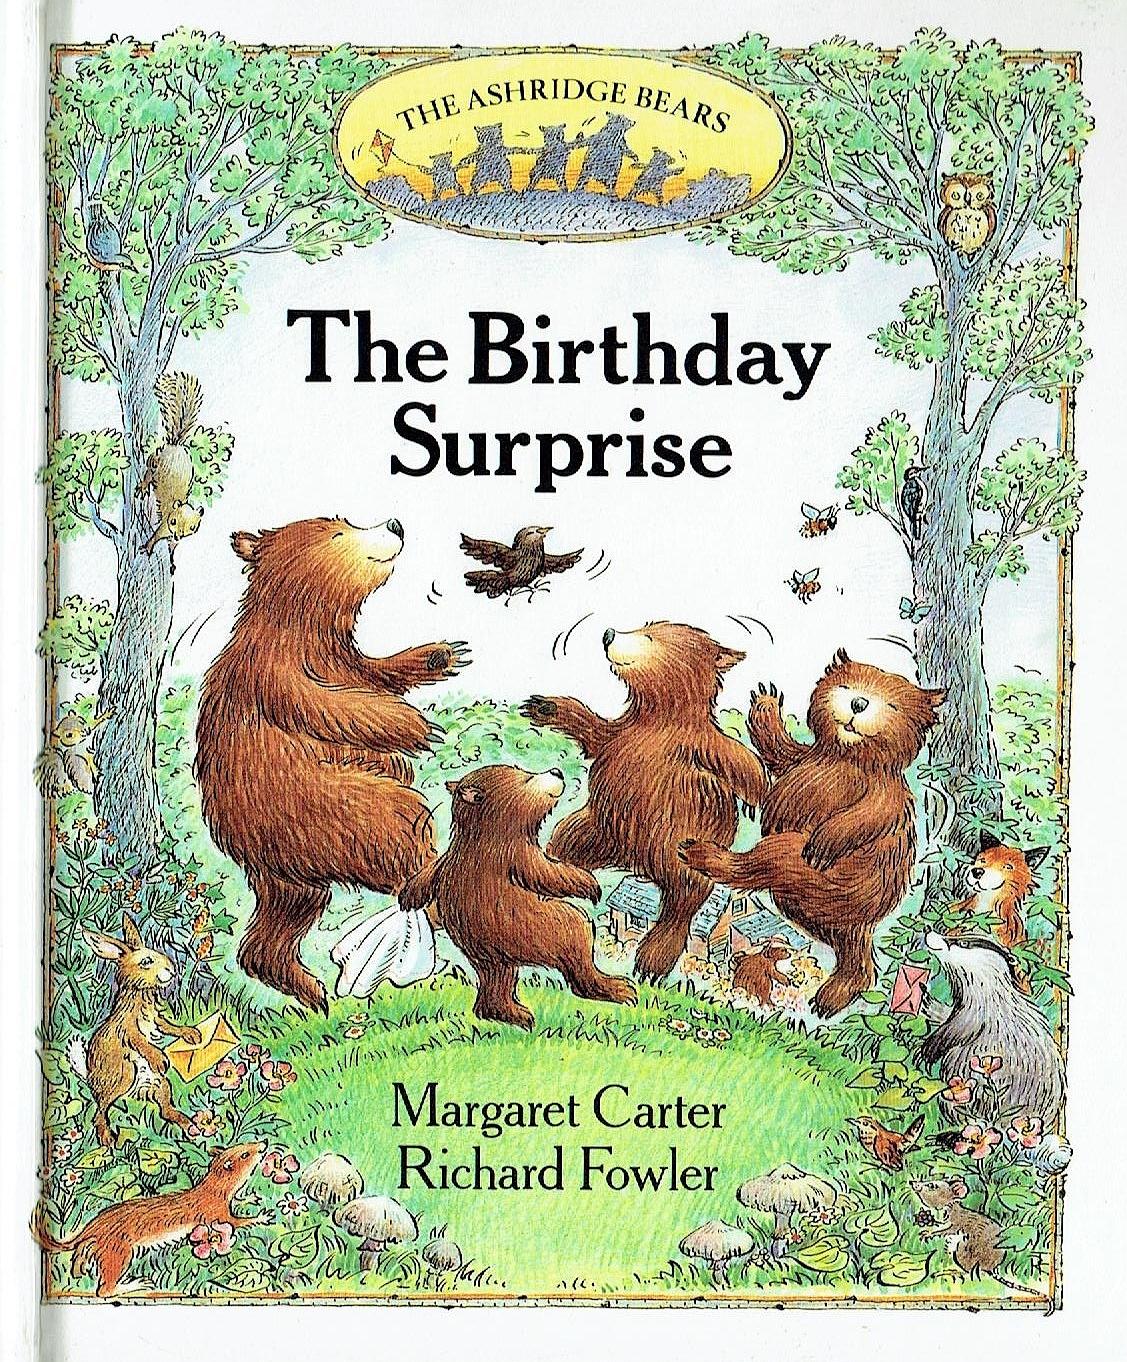 The Ashridge Bears